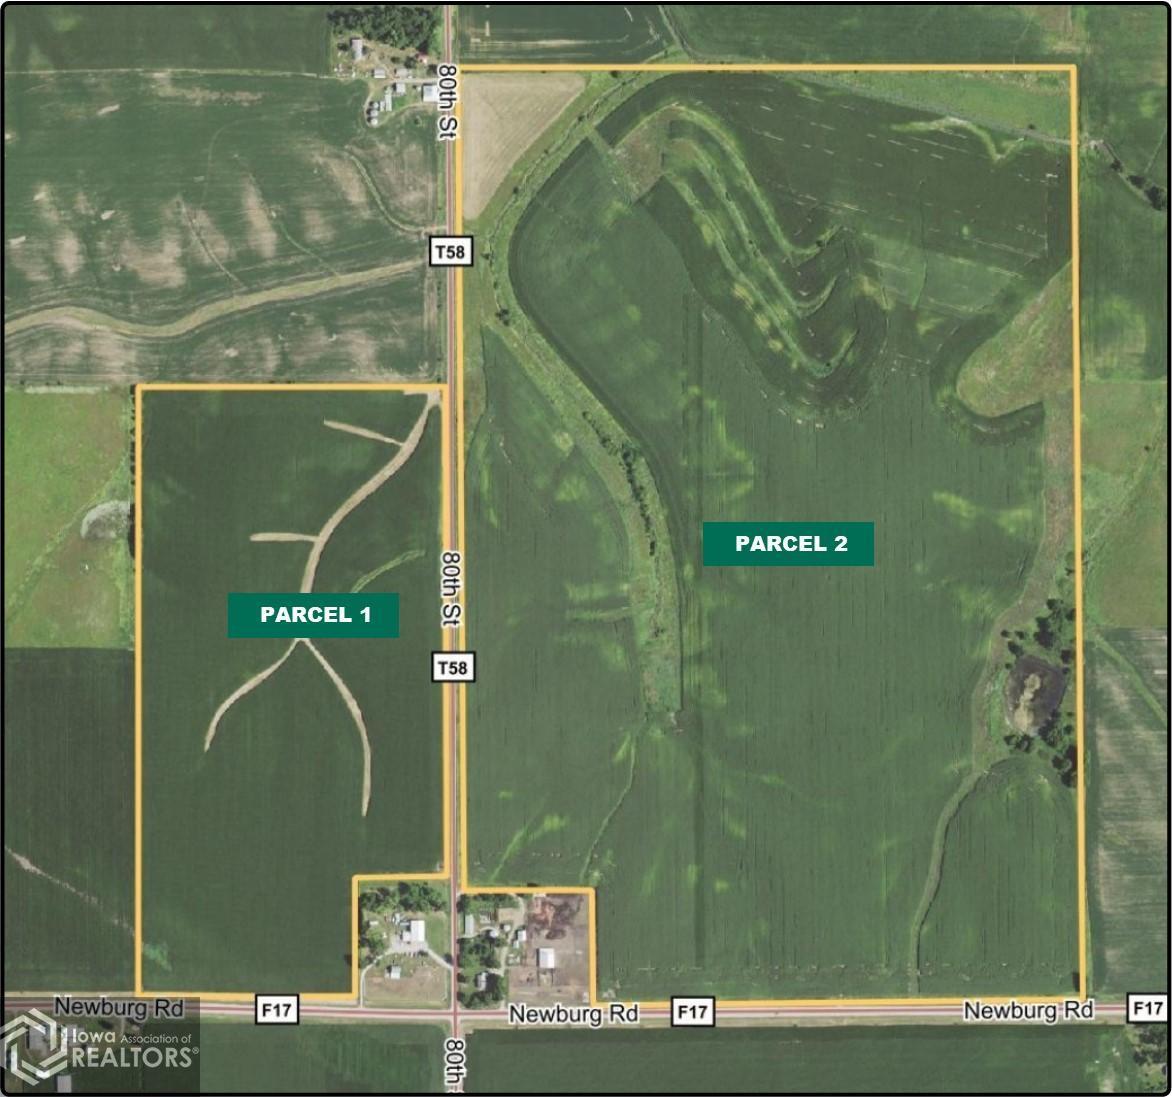 0 Newburg Rd. at 80th St., Grinnell, Iowa 50112, ,Farm,For Sale,Newburg Rd. at 80th St.,6111565